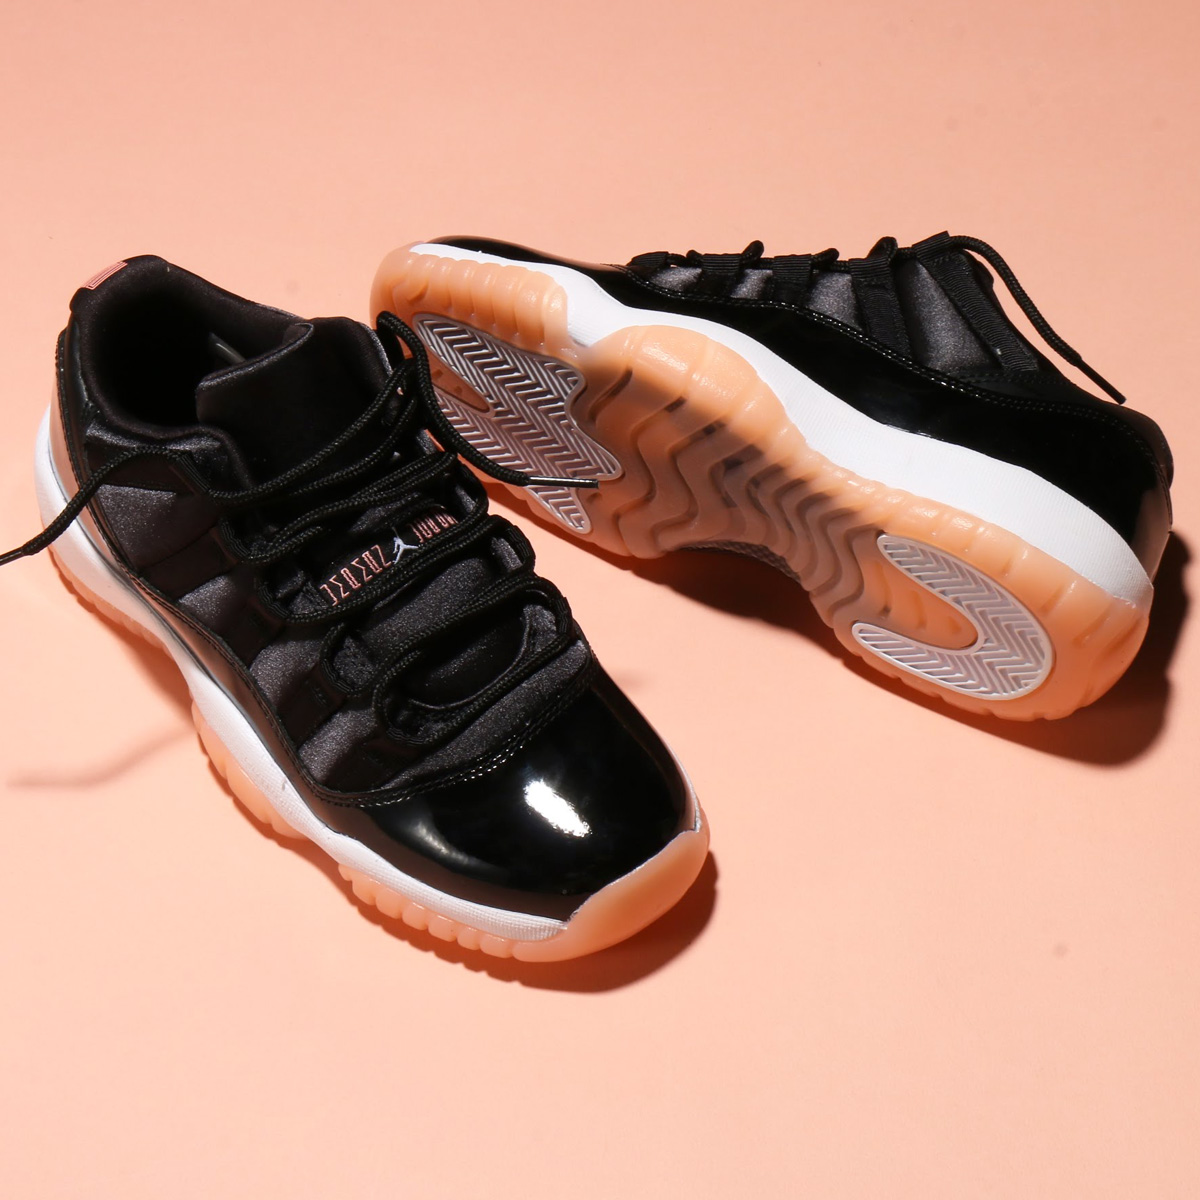 outlet store a114d ed884 NIKE AIR JORDAN 11 RETRO LOW GG (Nike Air Jordan 11 nostalgic low GG) ...